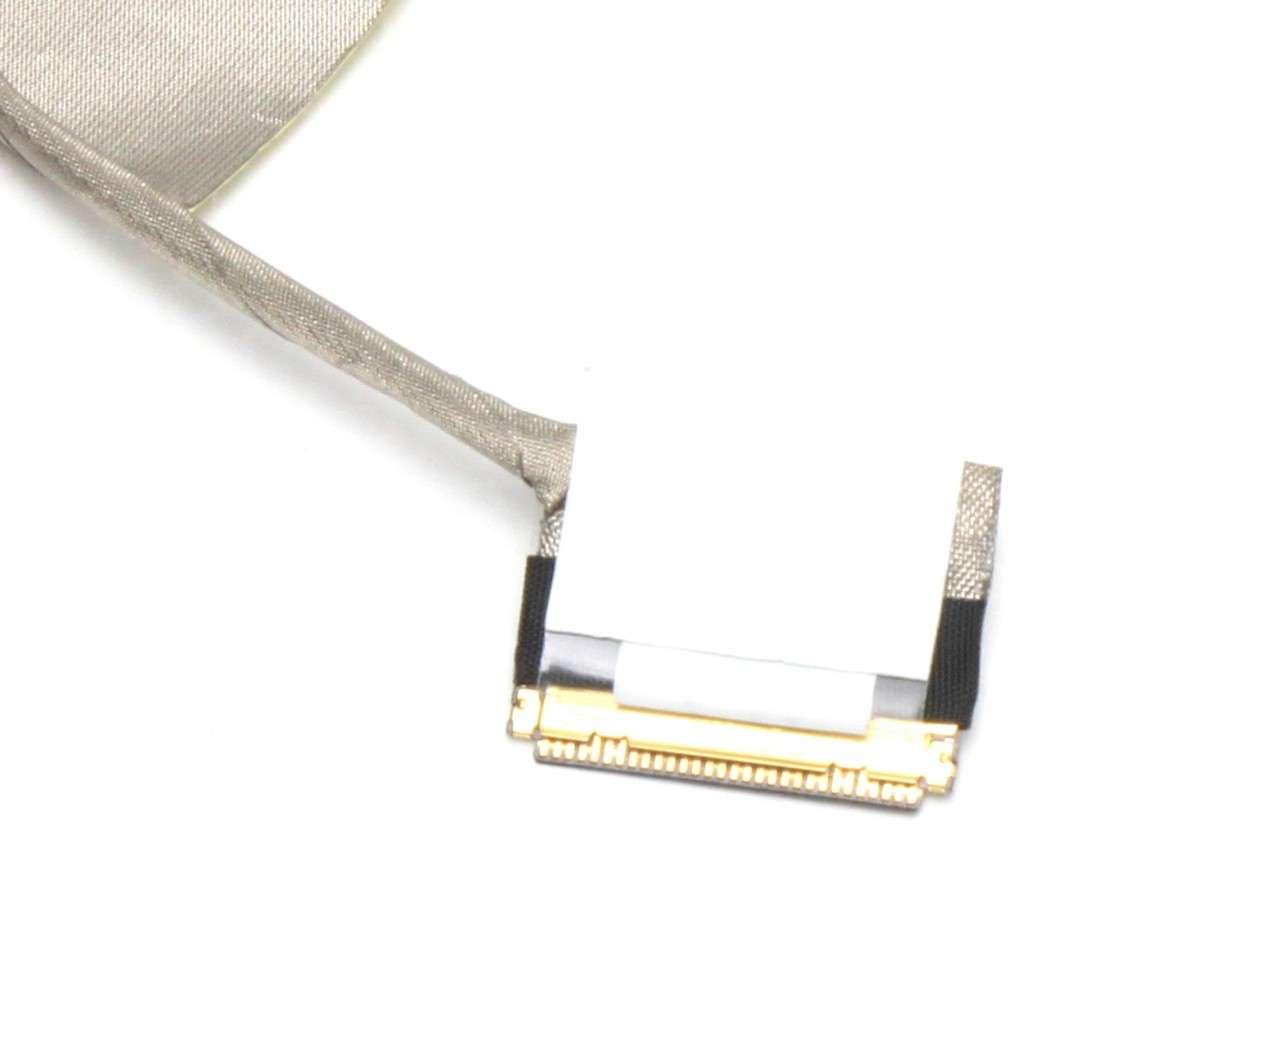 Cablu video eDP Asus N550JA imagine powerlaptop.ro 2021